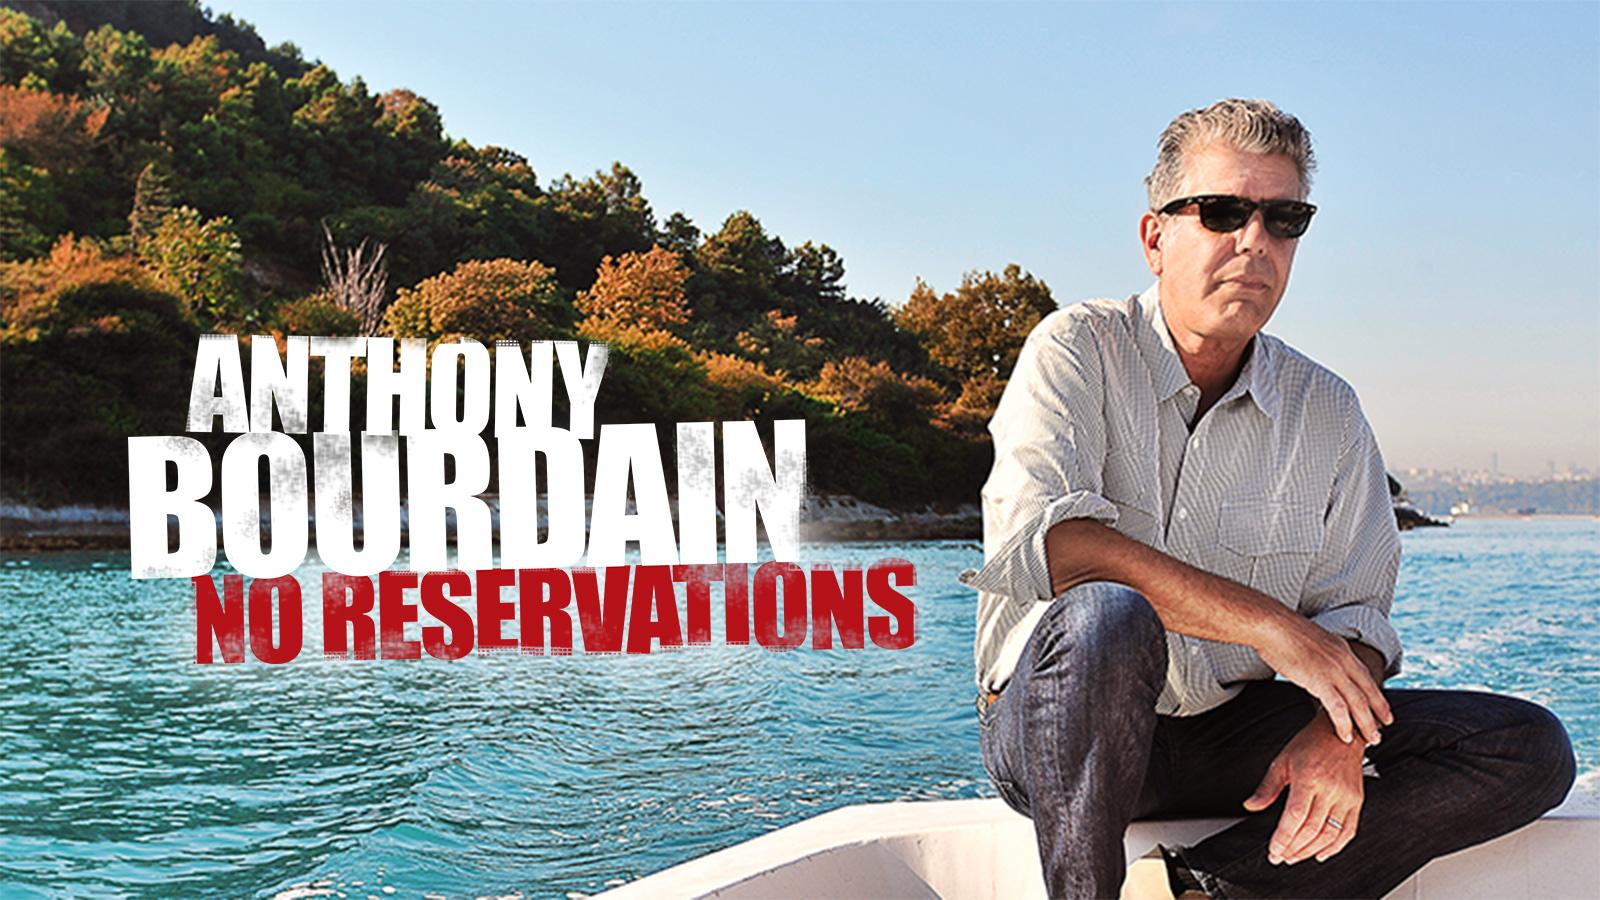 Anthony_Bourdain_No_Reservations_hero